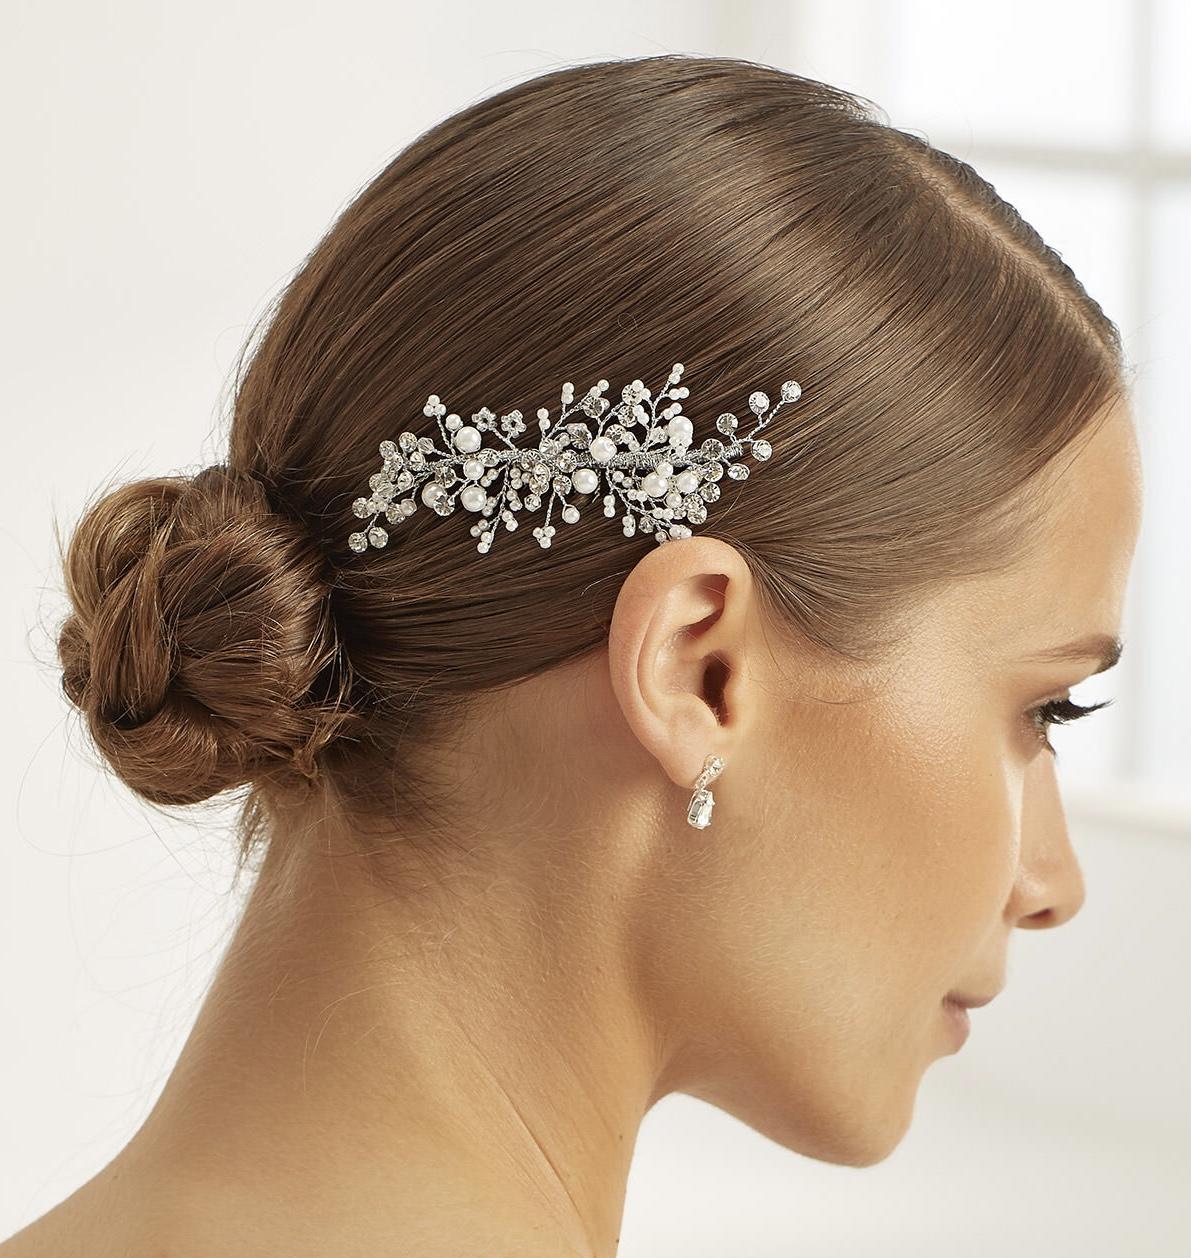 395 Hair Accessory